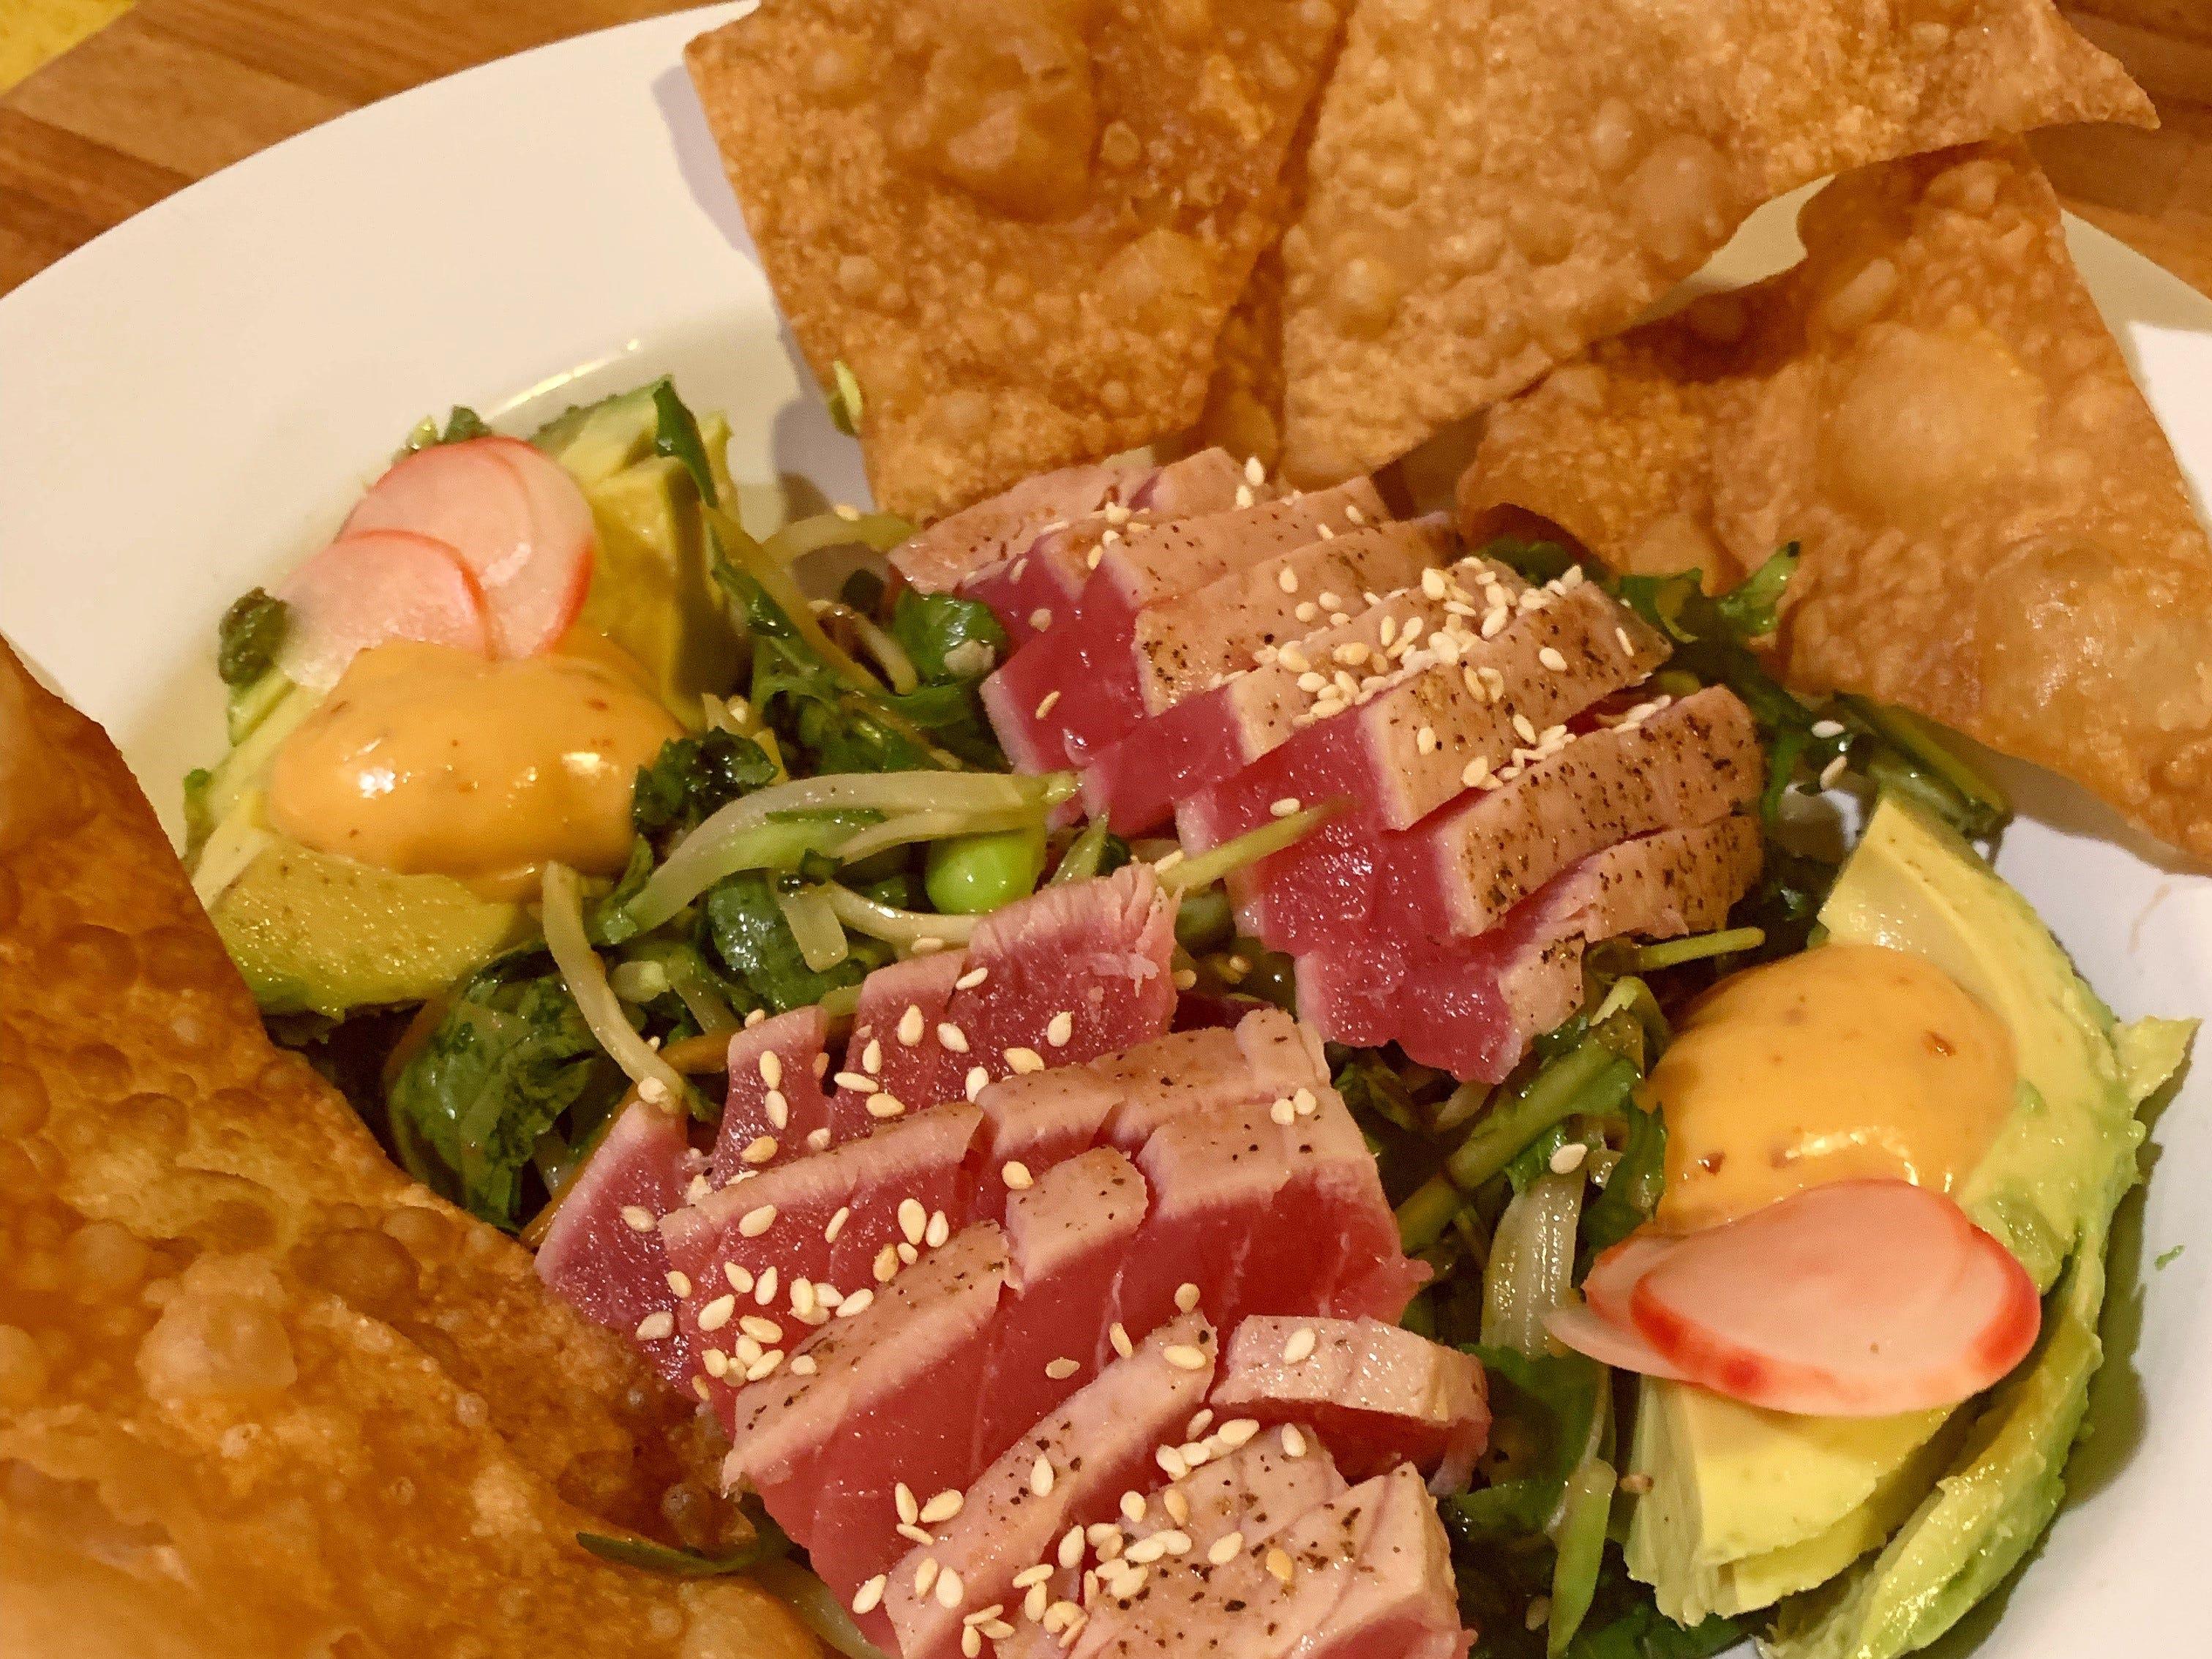 Tuna salad gets a fancy makeover